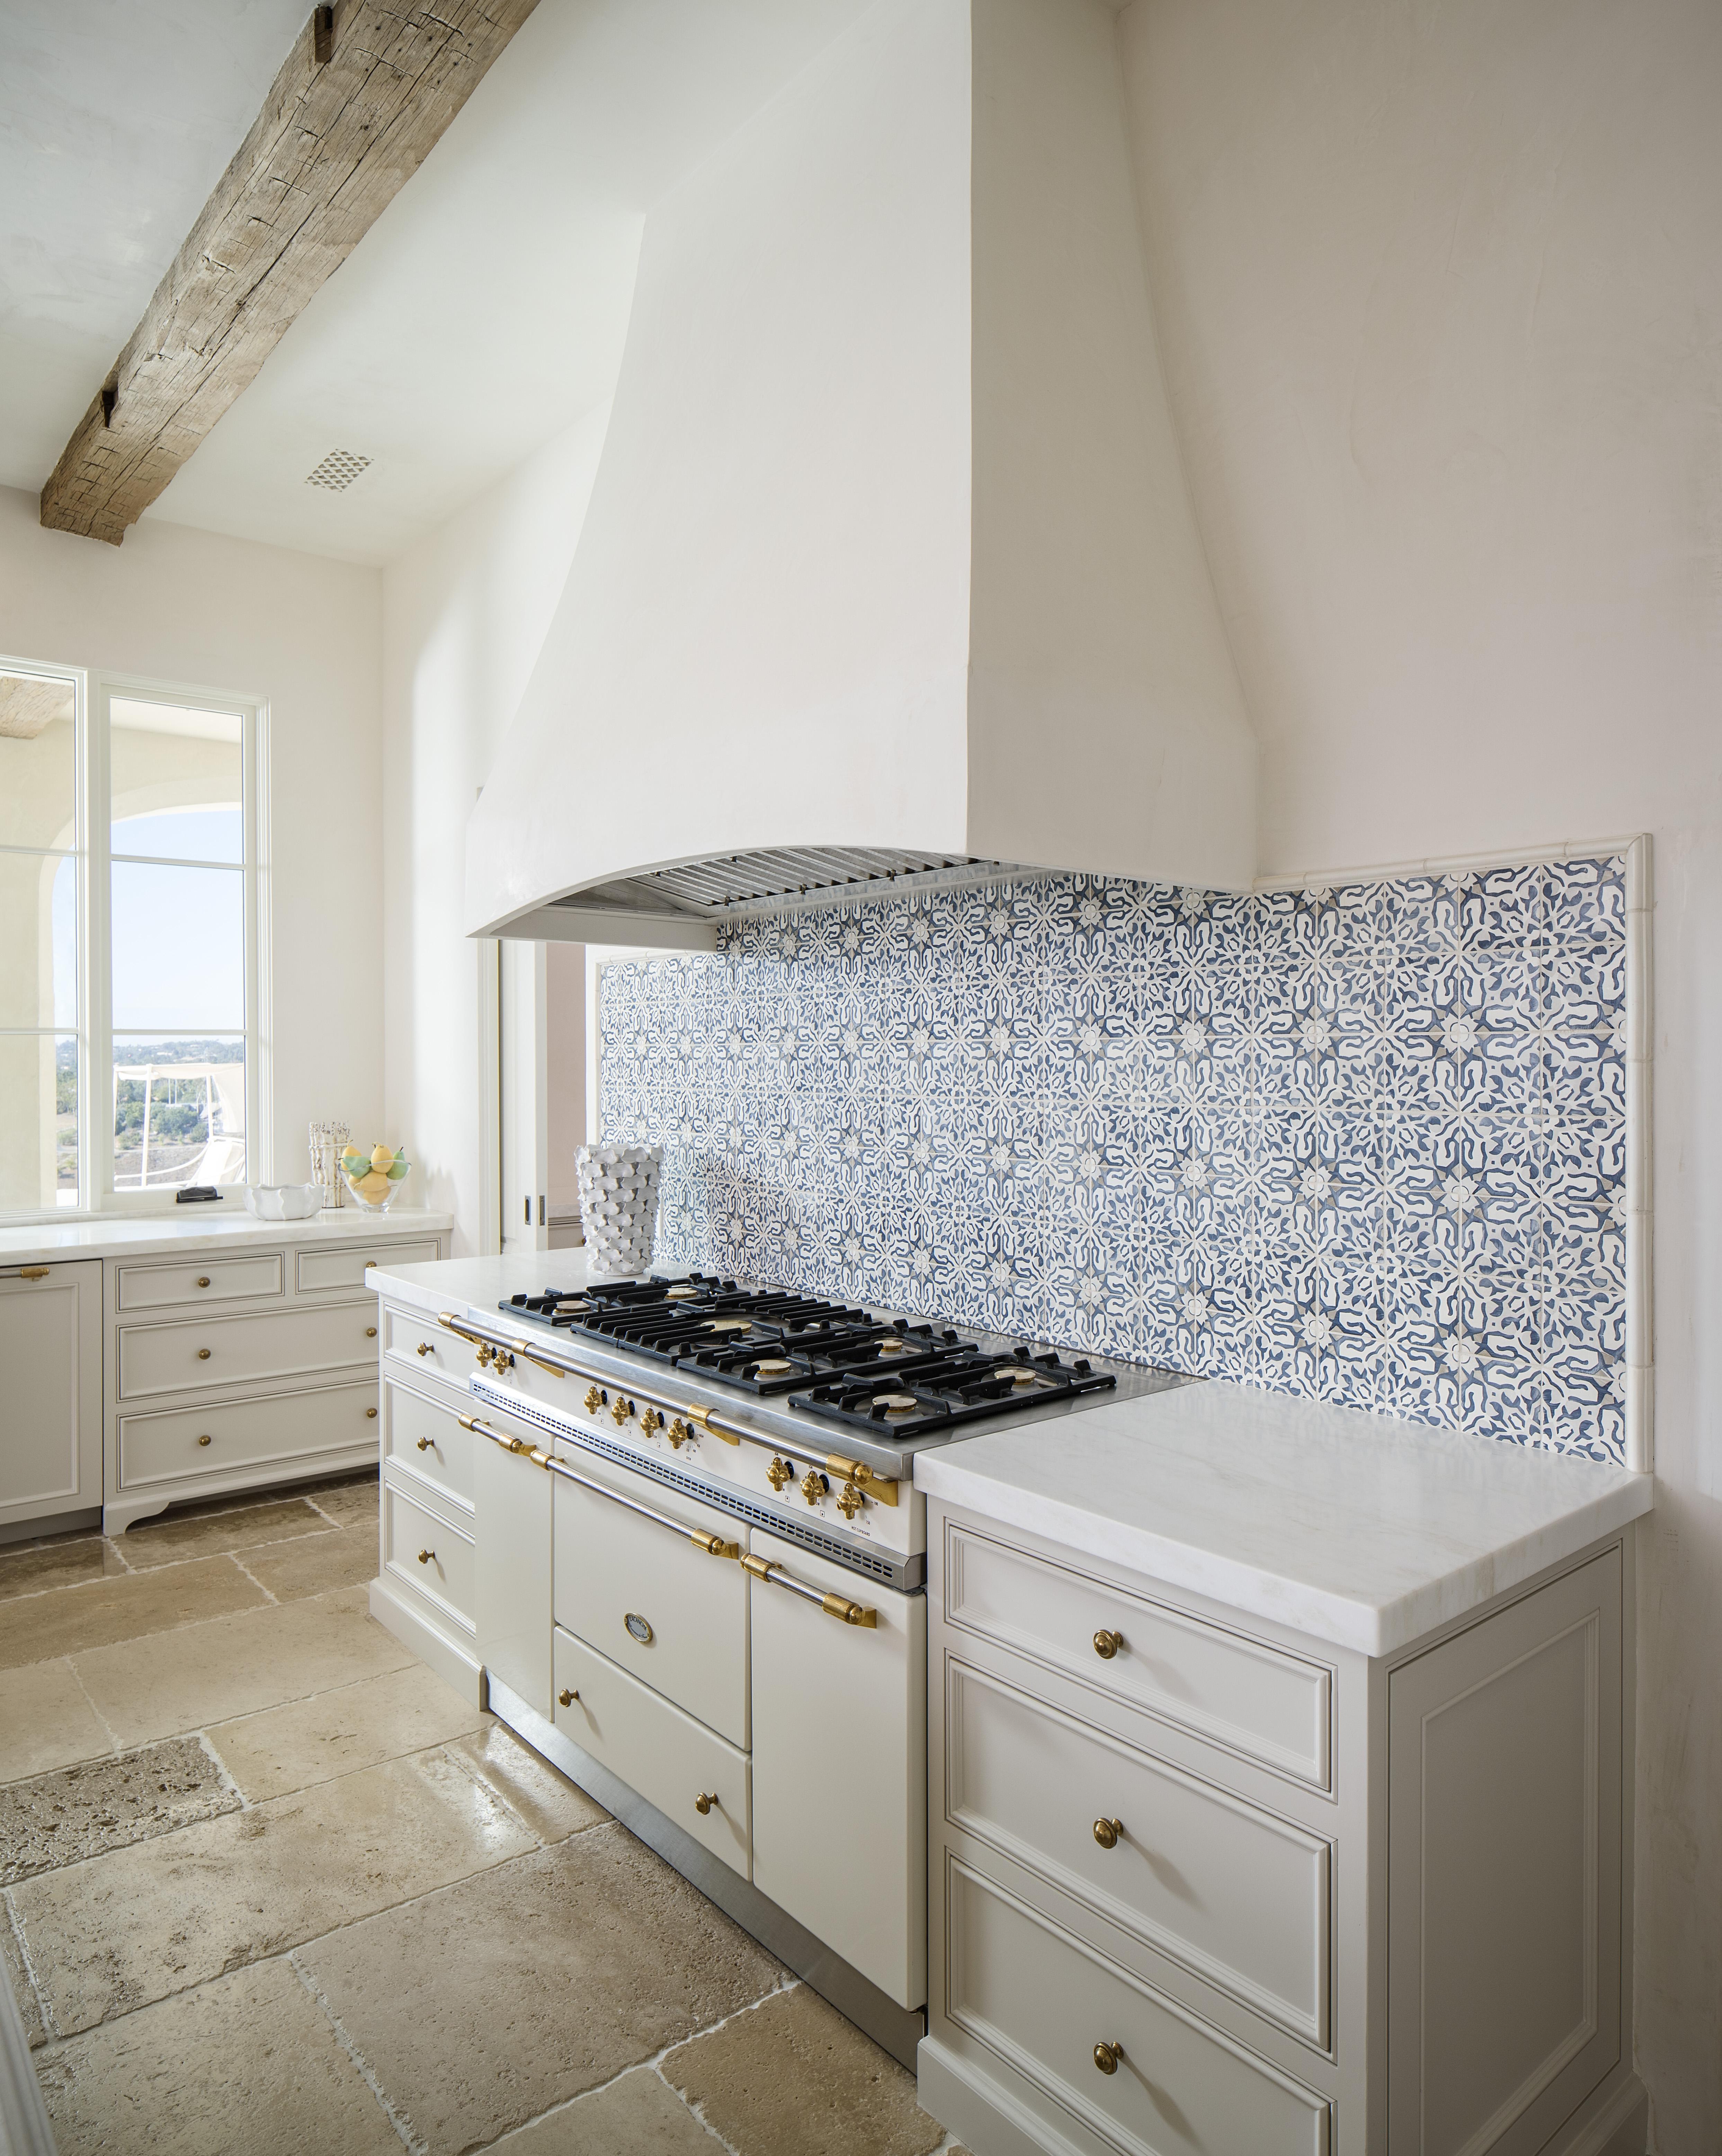 Fontenay Cooking Range Art Culinaire Lacanche Usa